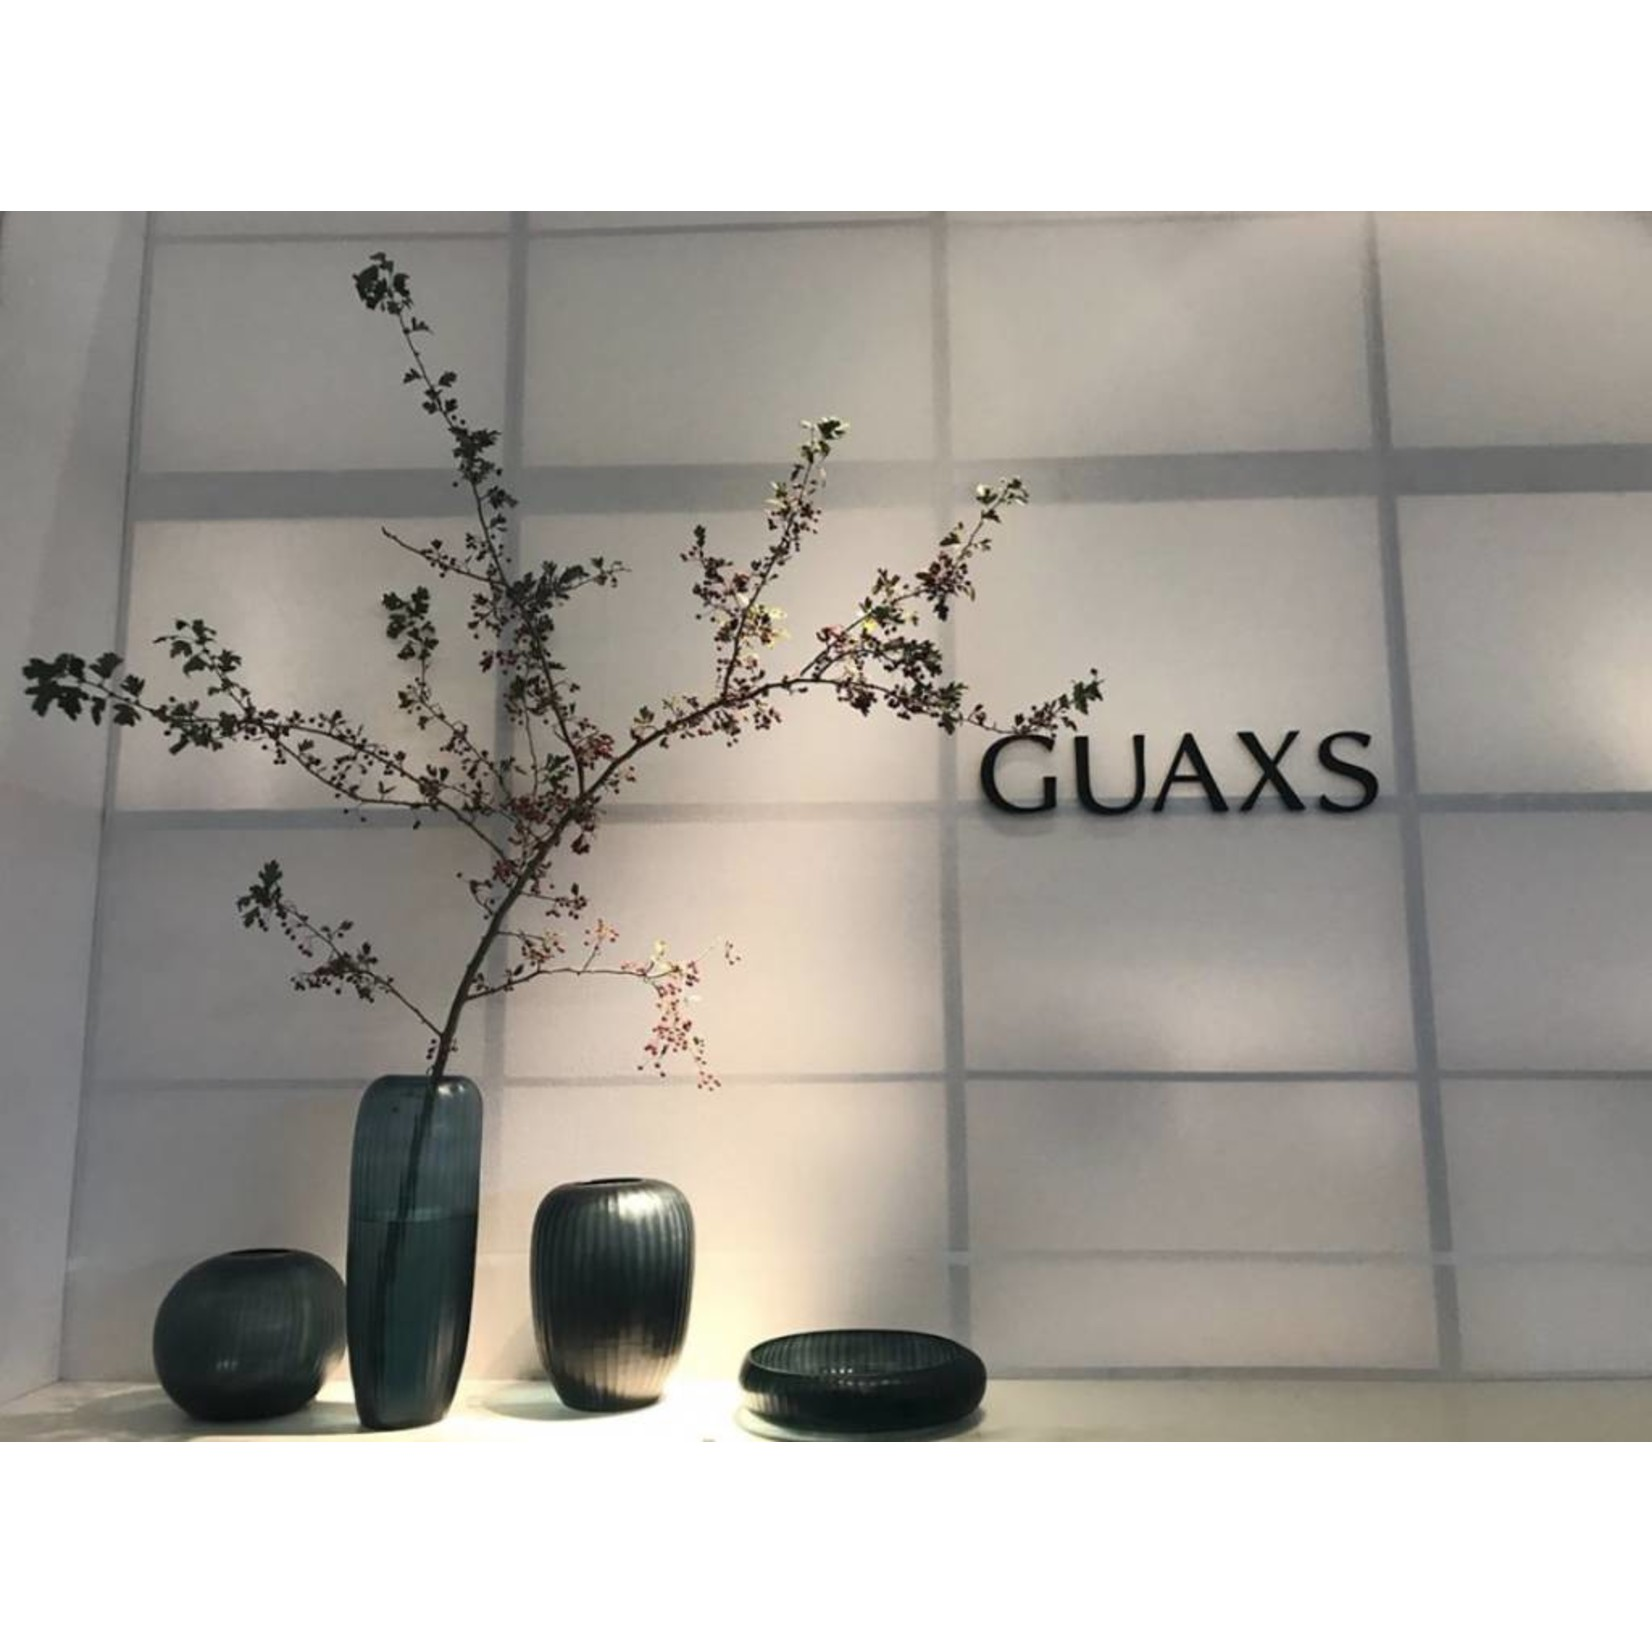 Guaxs Vaas Gobi High | Ocean Blue / Indigo